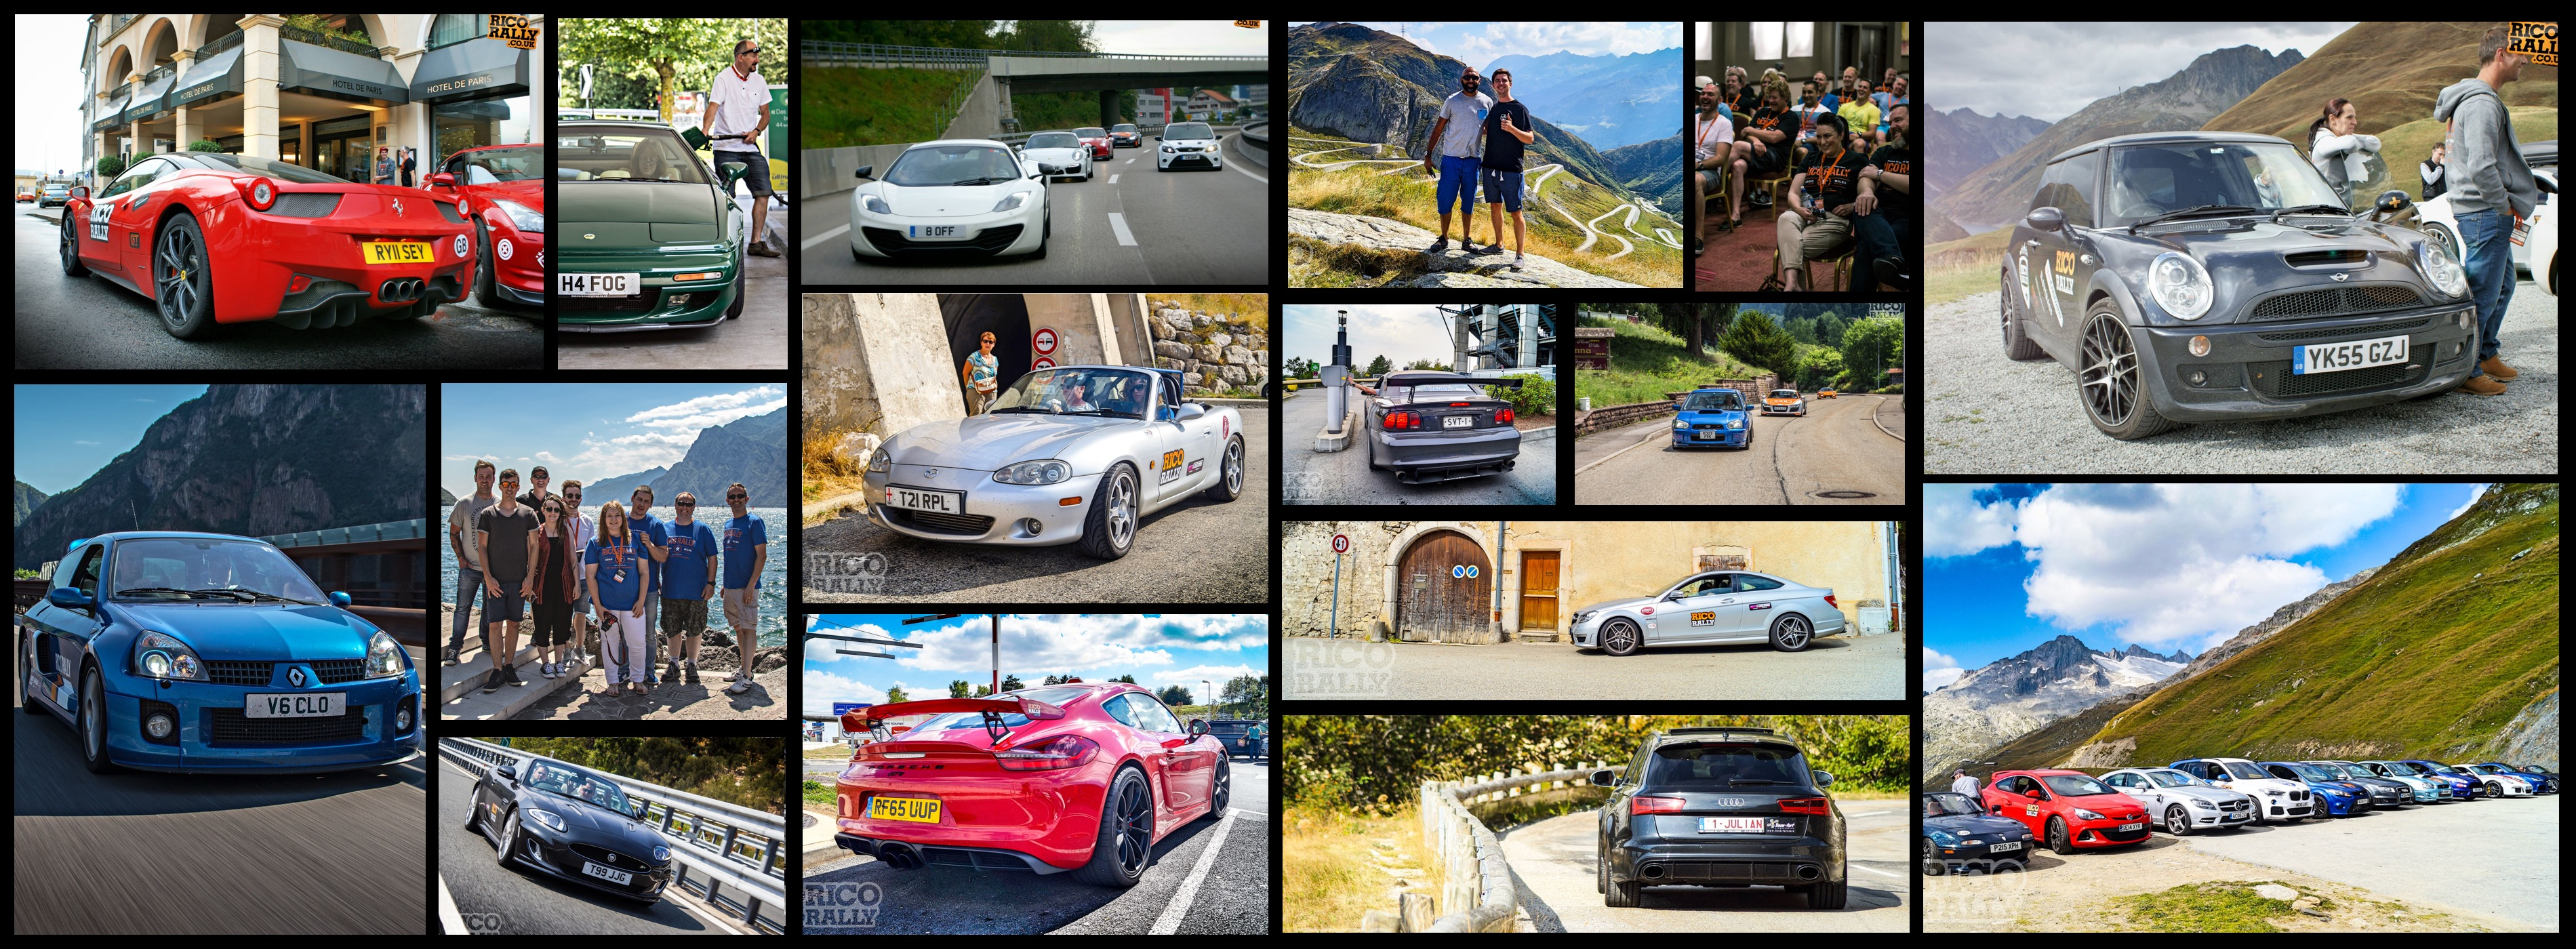 Rico-Rally-Website-Slider-2